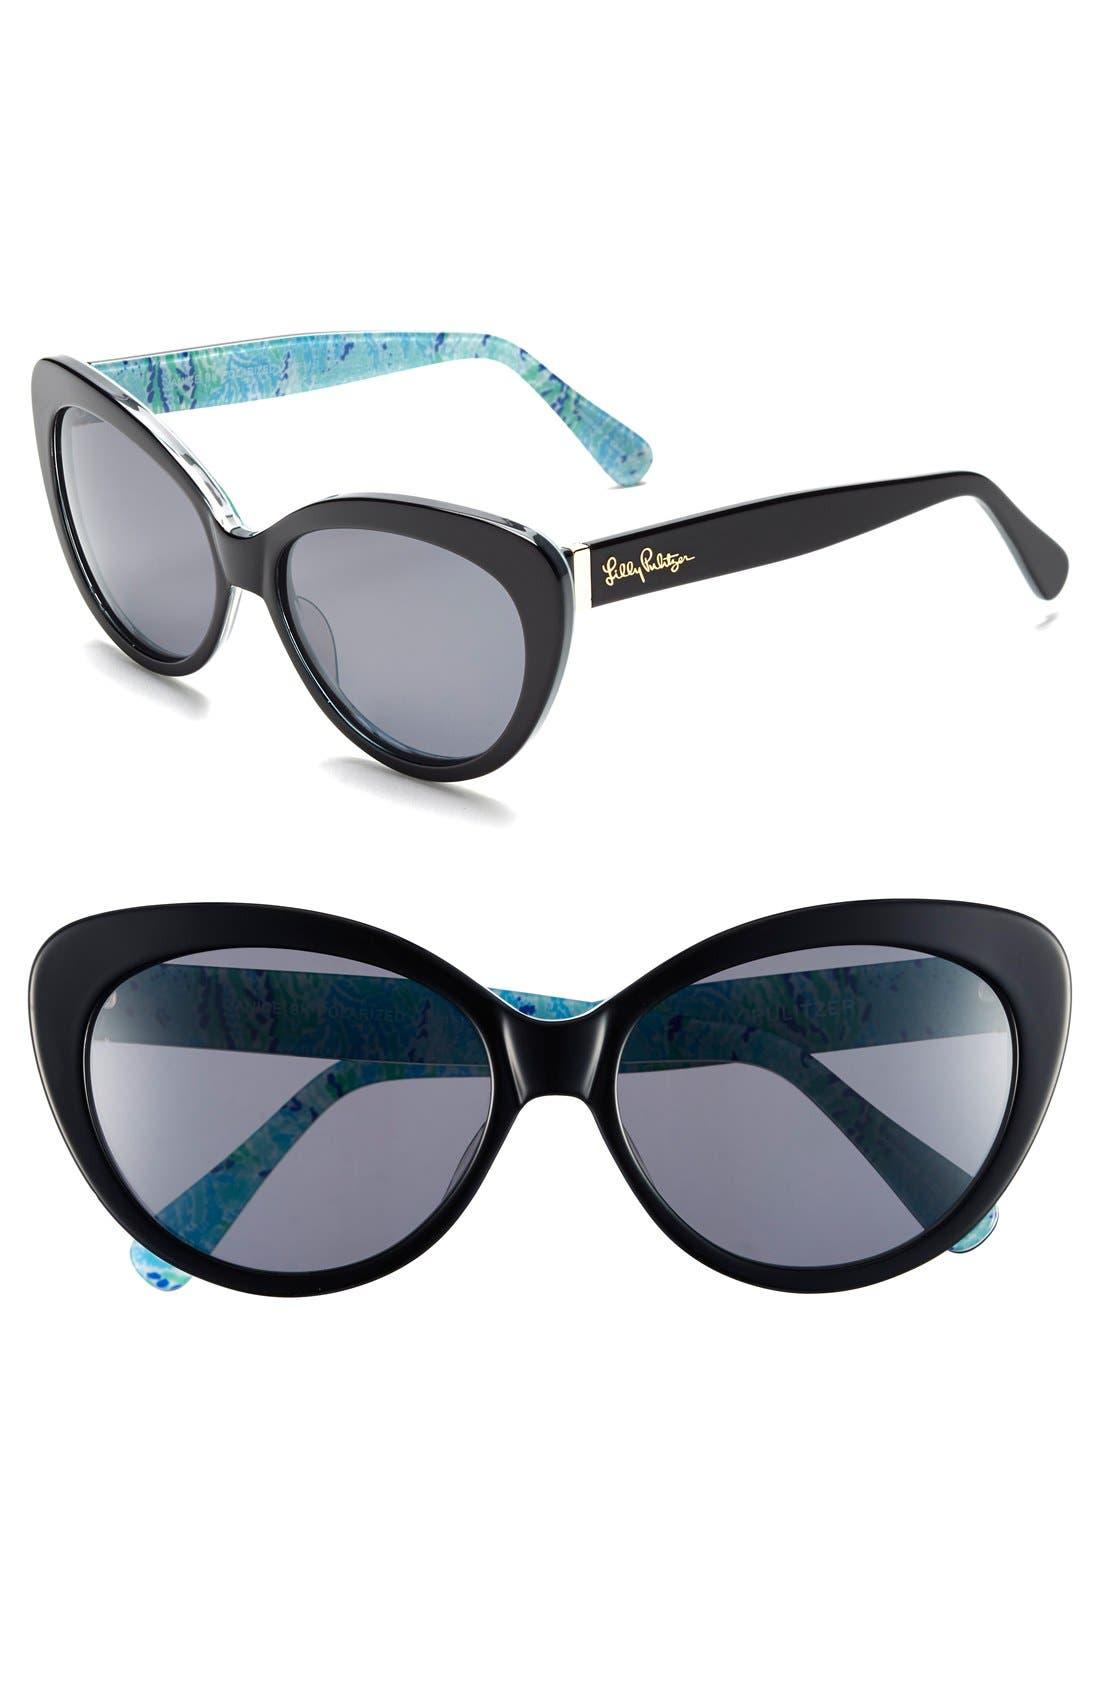 Main Image - Lilly Pulitzer® 'Janice' 58mm Polarized Sunglasses